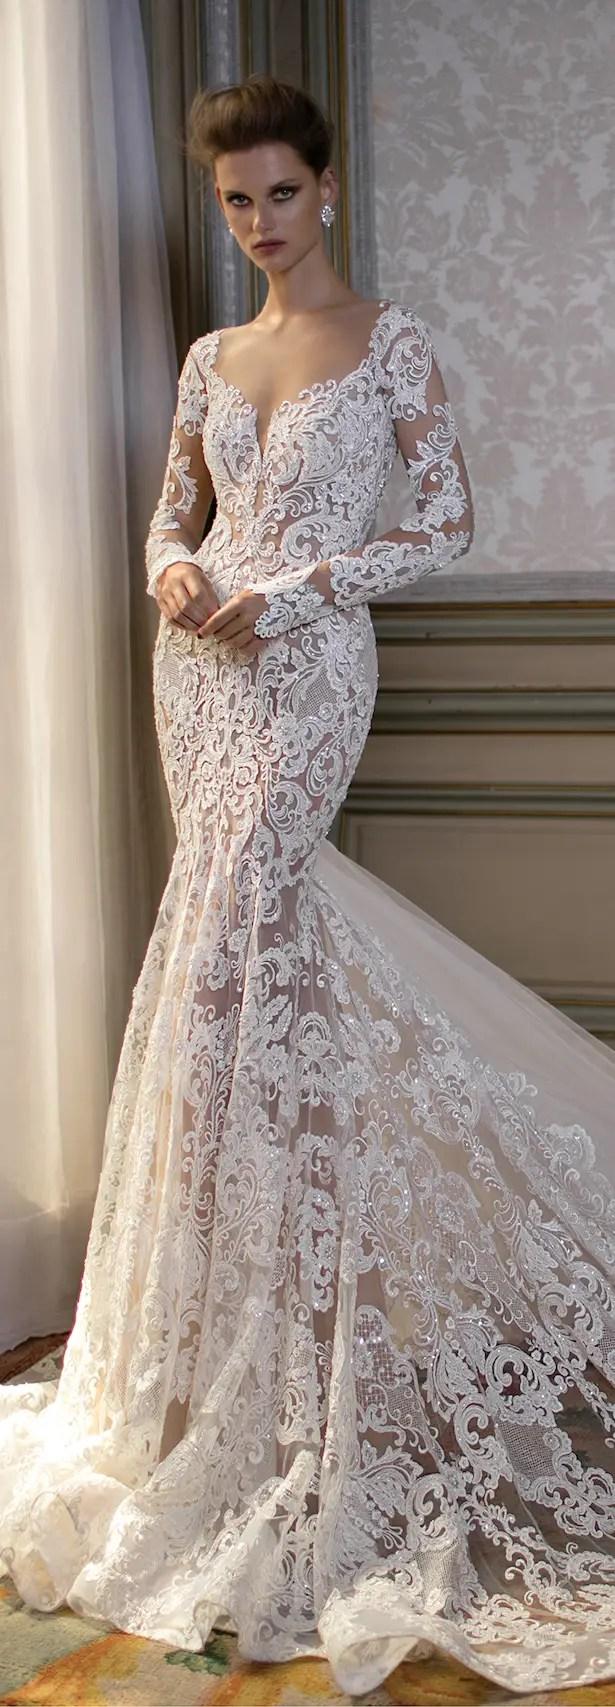 berta bridal spring wedding dresses berta wedding dresses Wedding Dress by Berta Spring Bridal Collection